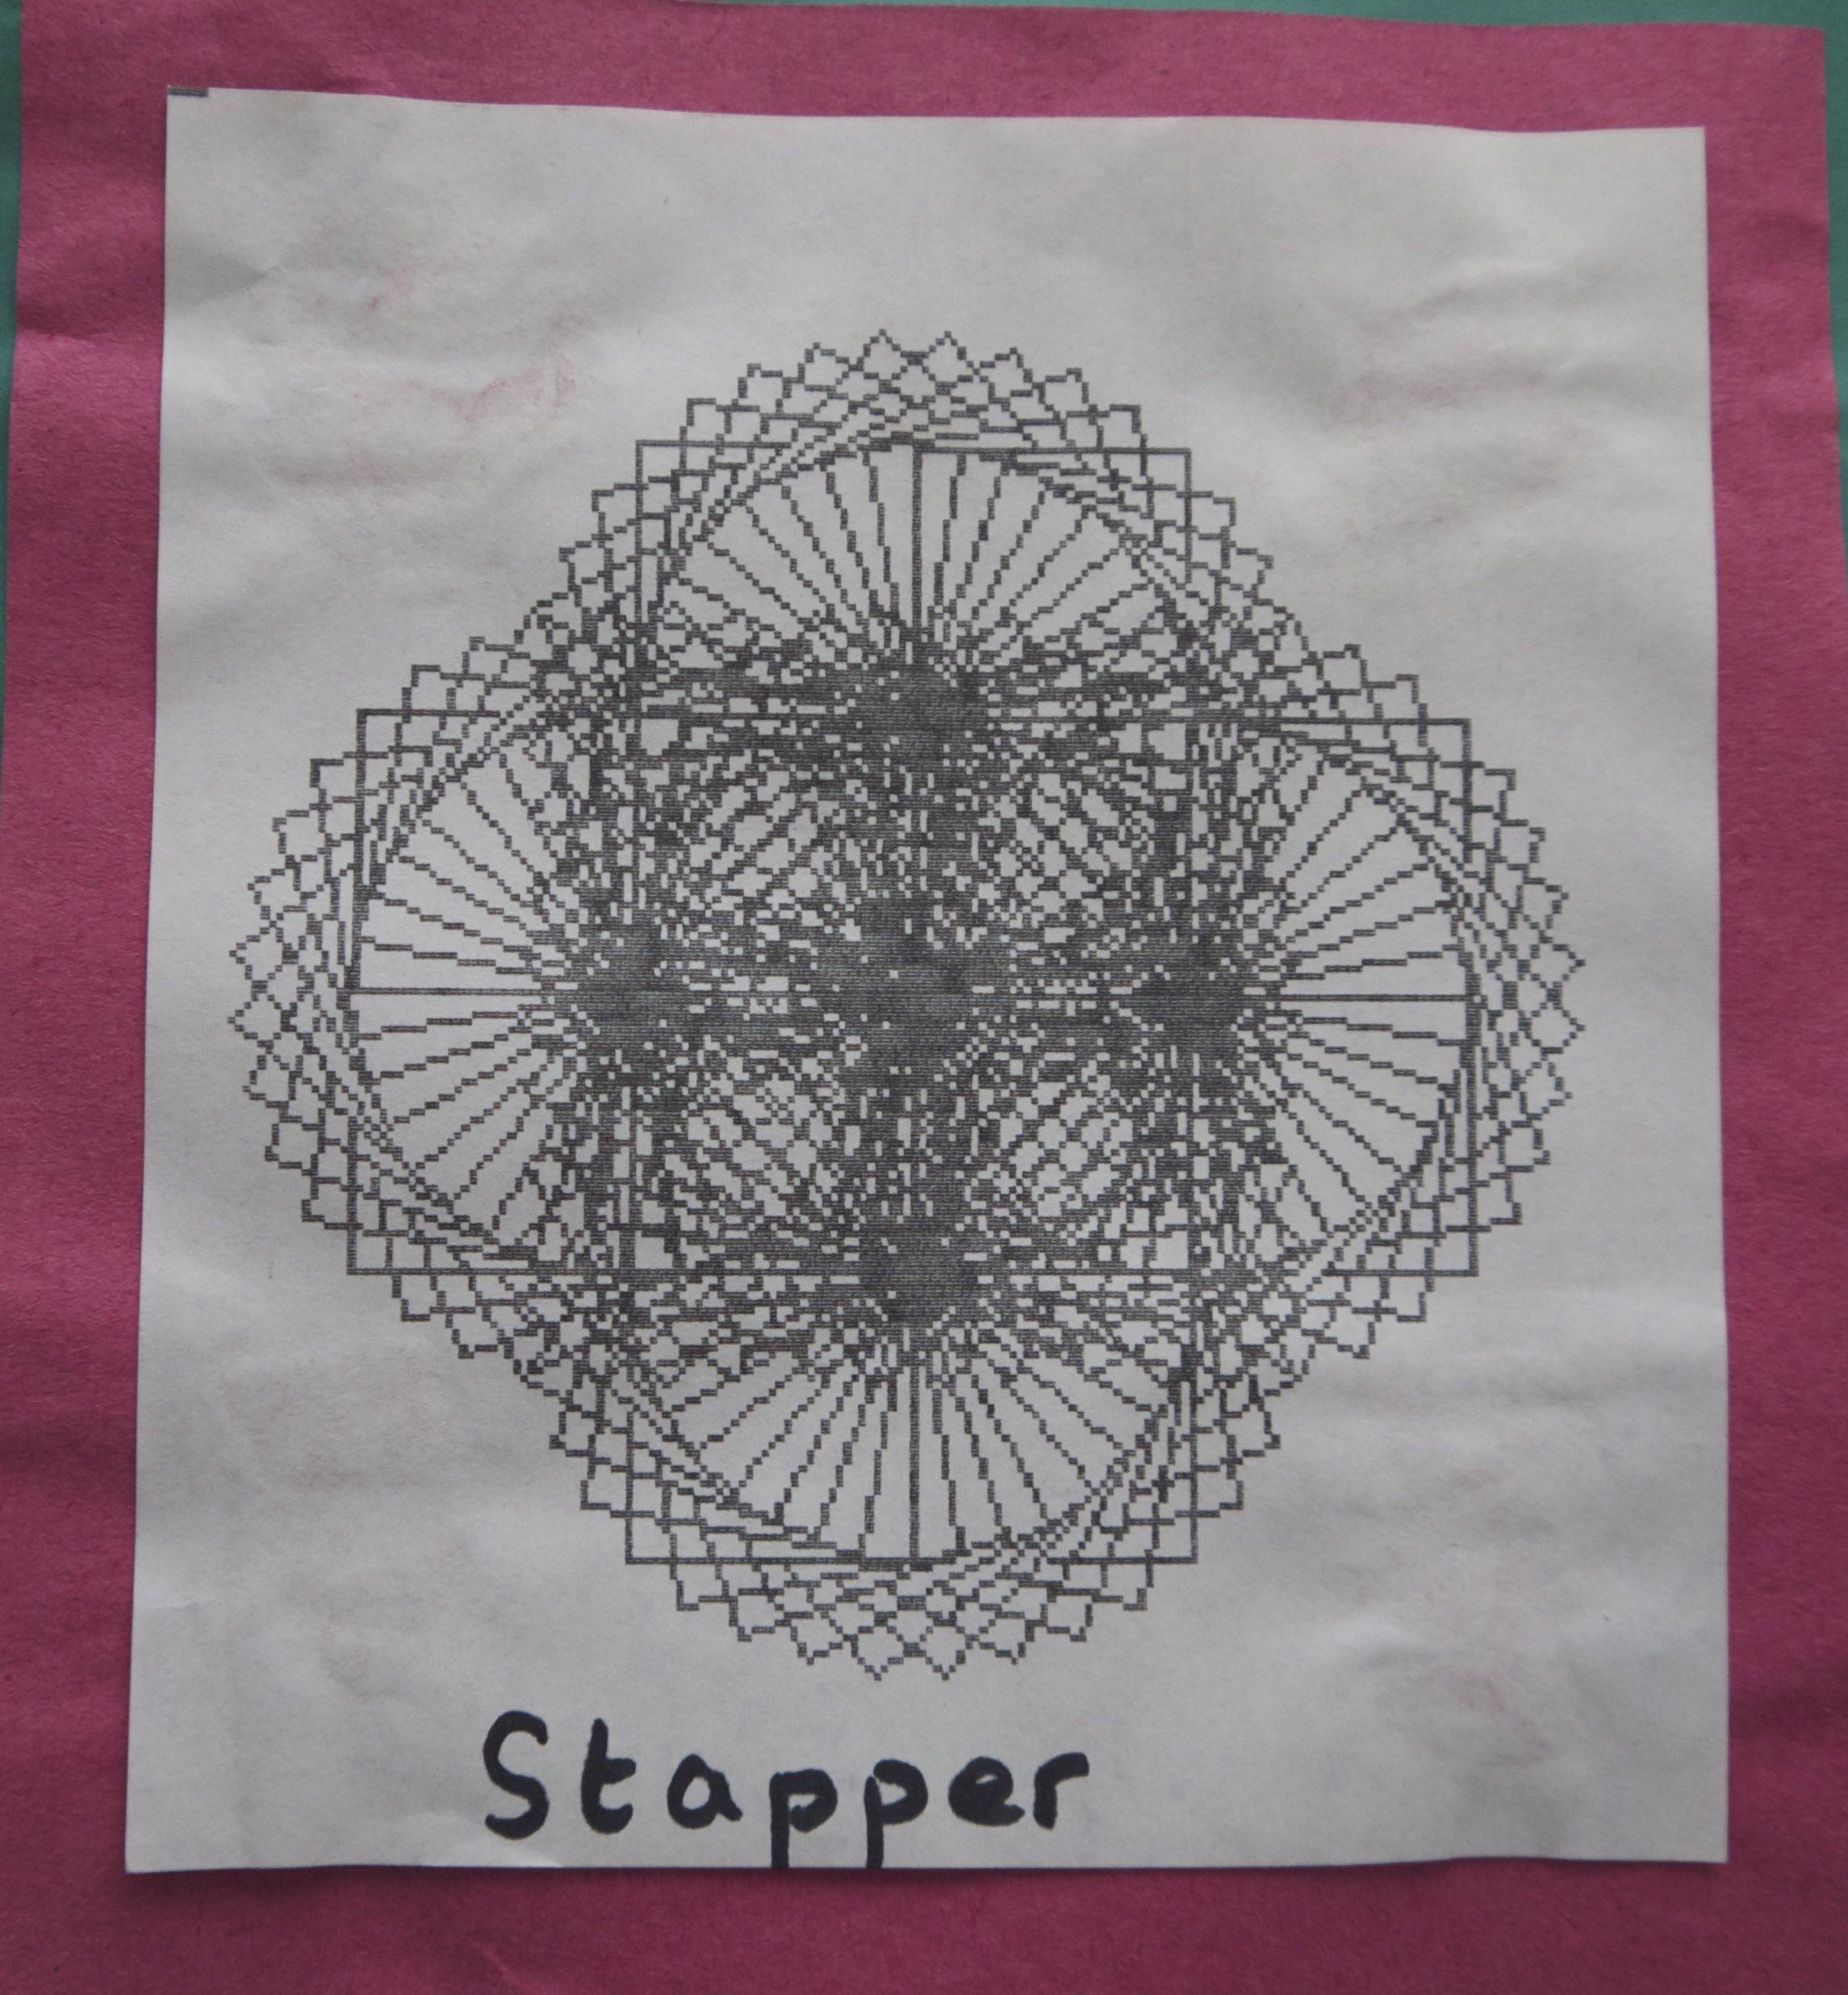 Stapper